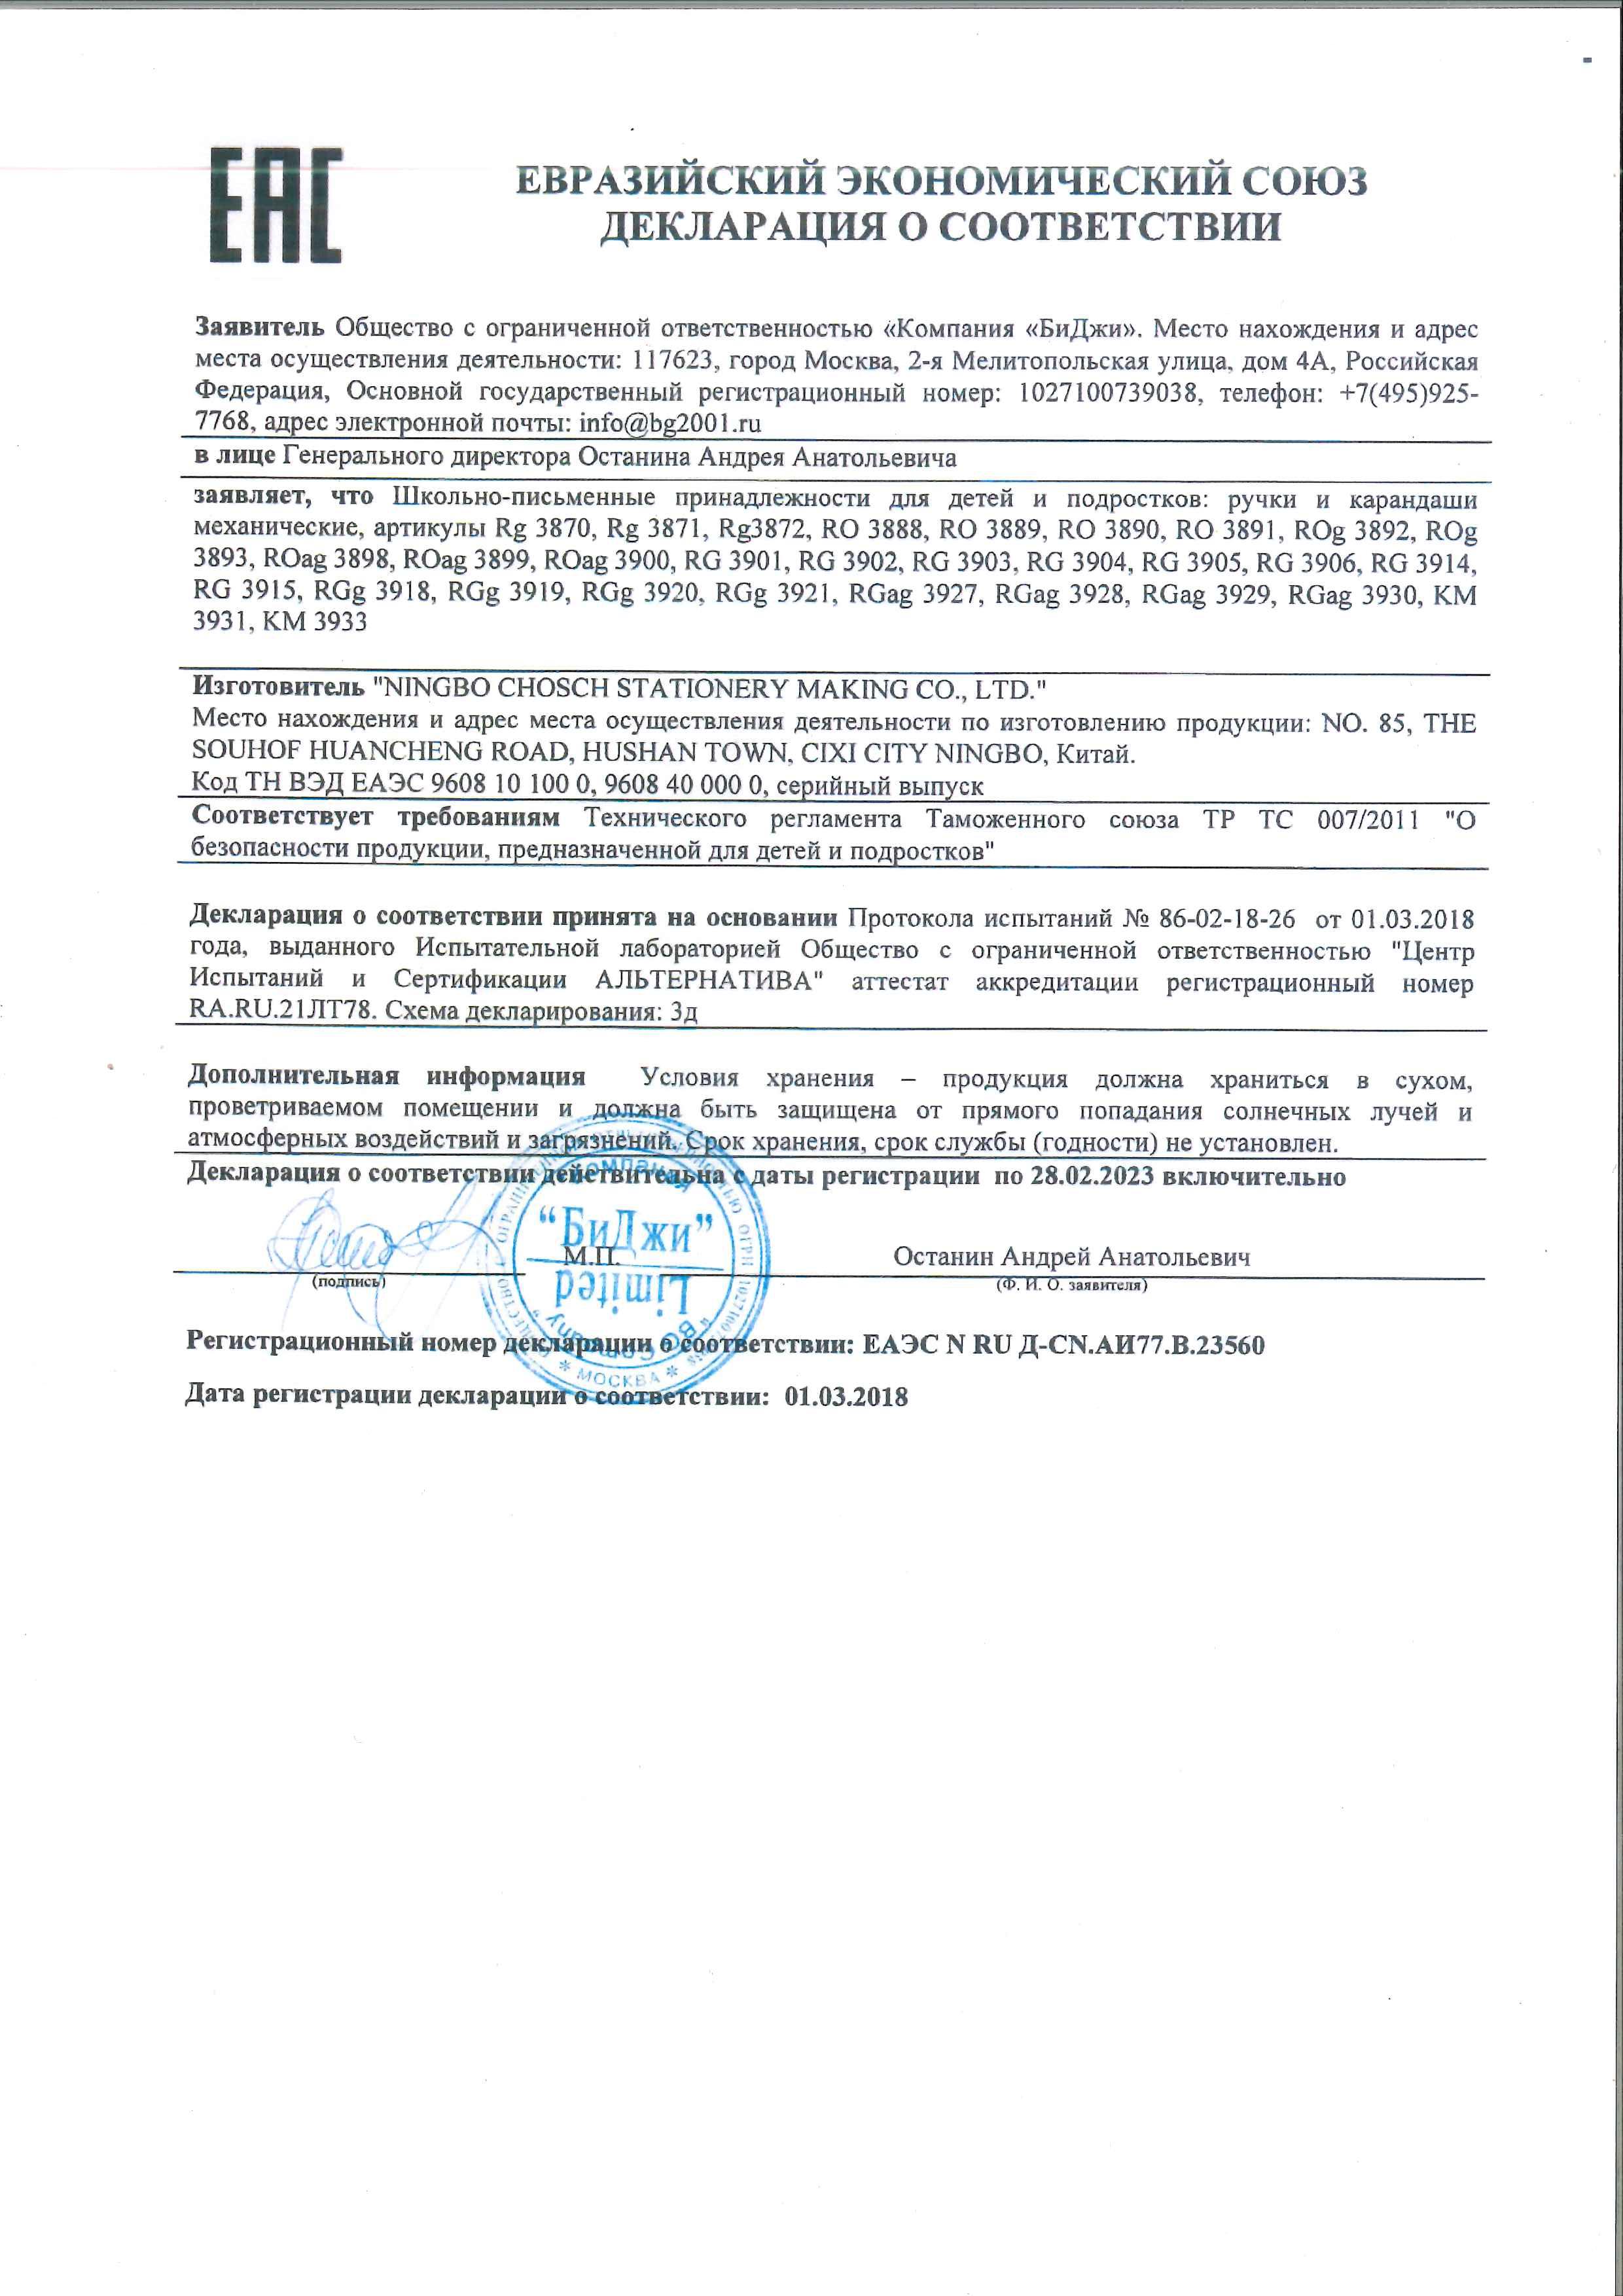 BG Ручки Ningbo (по 28.02.2023)